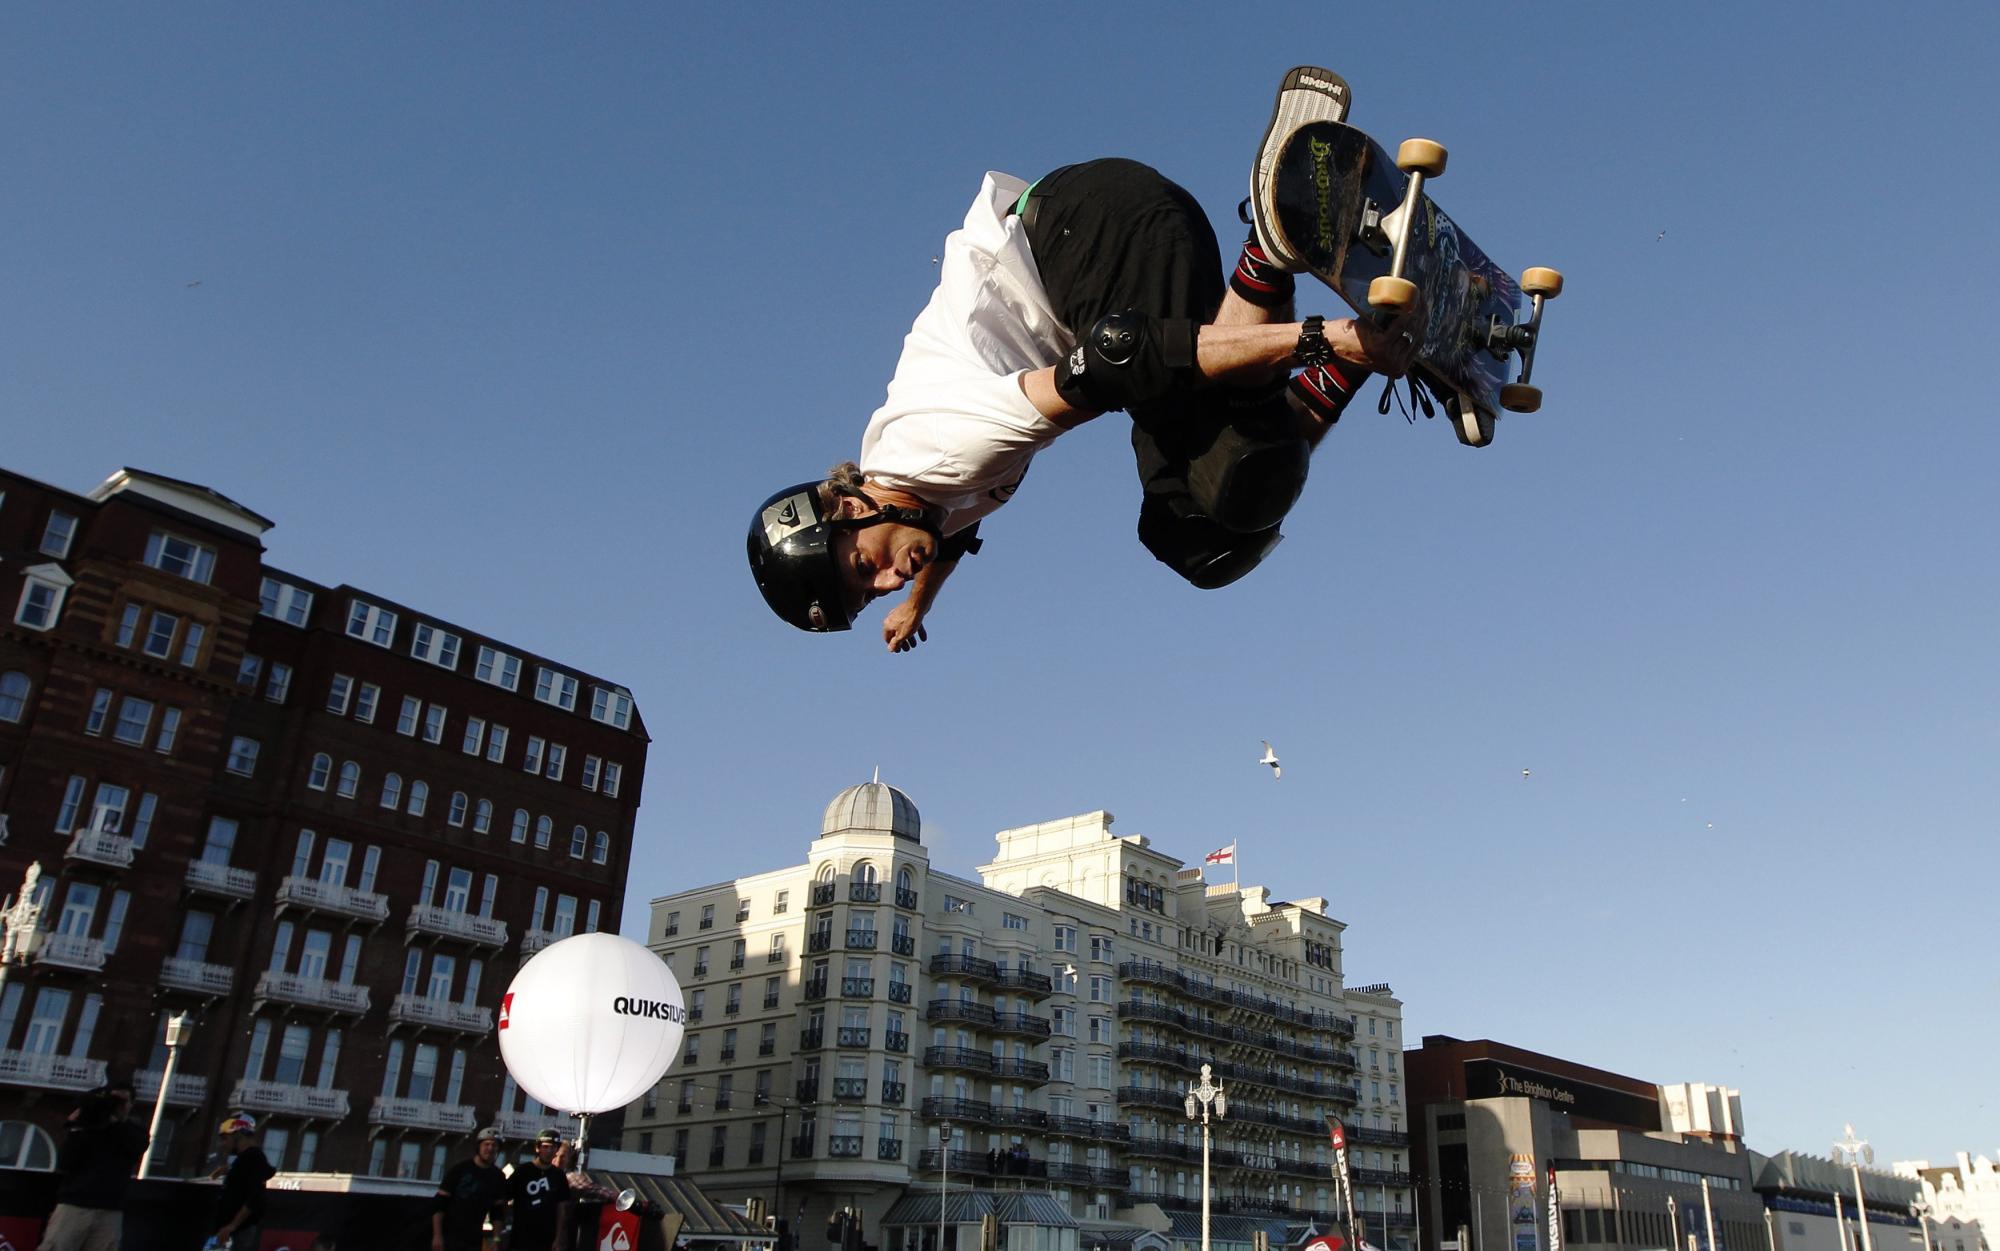 Skateboard_0002